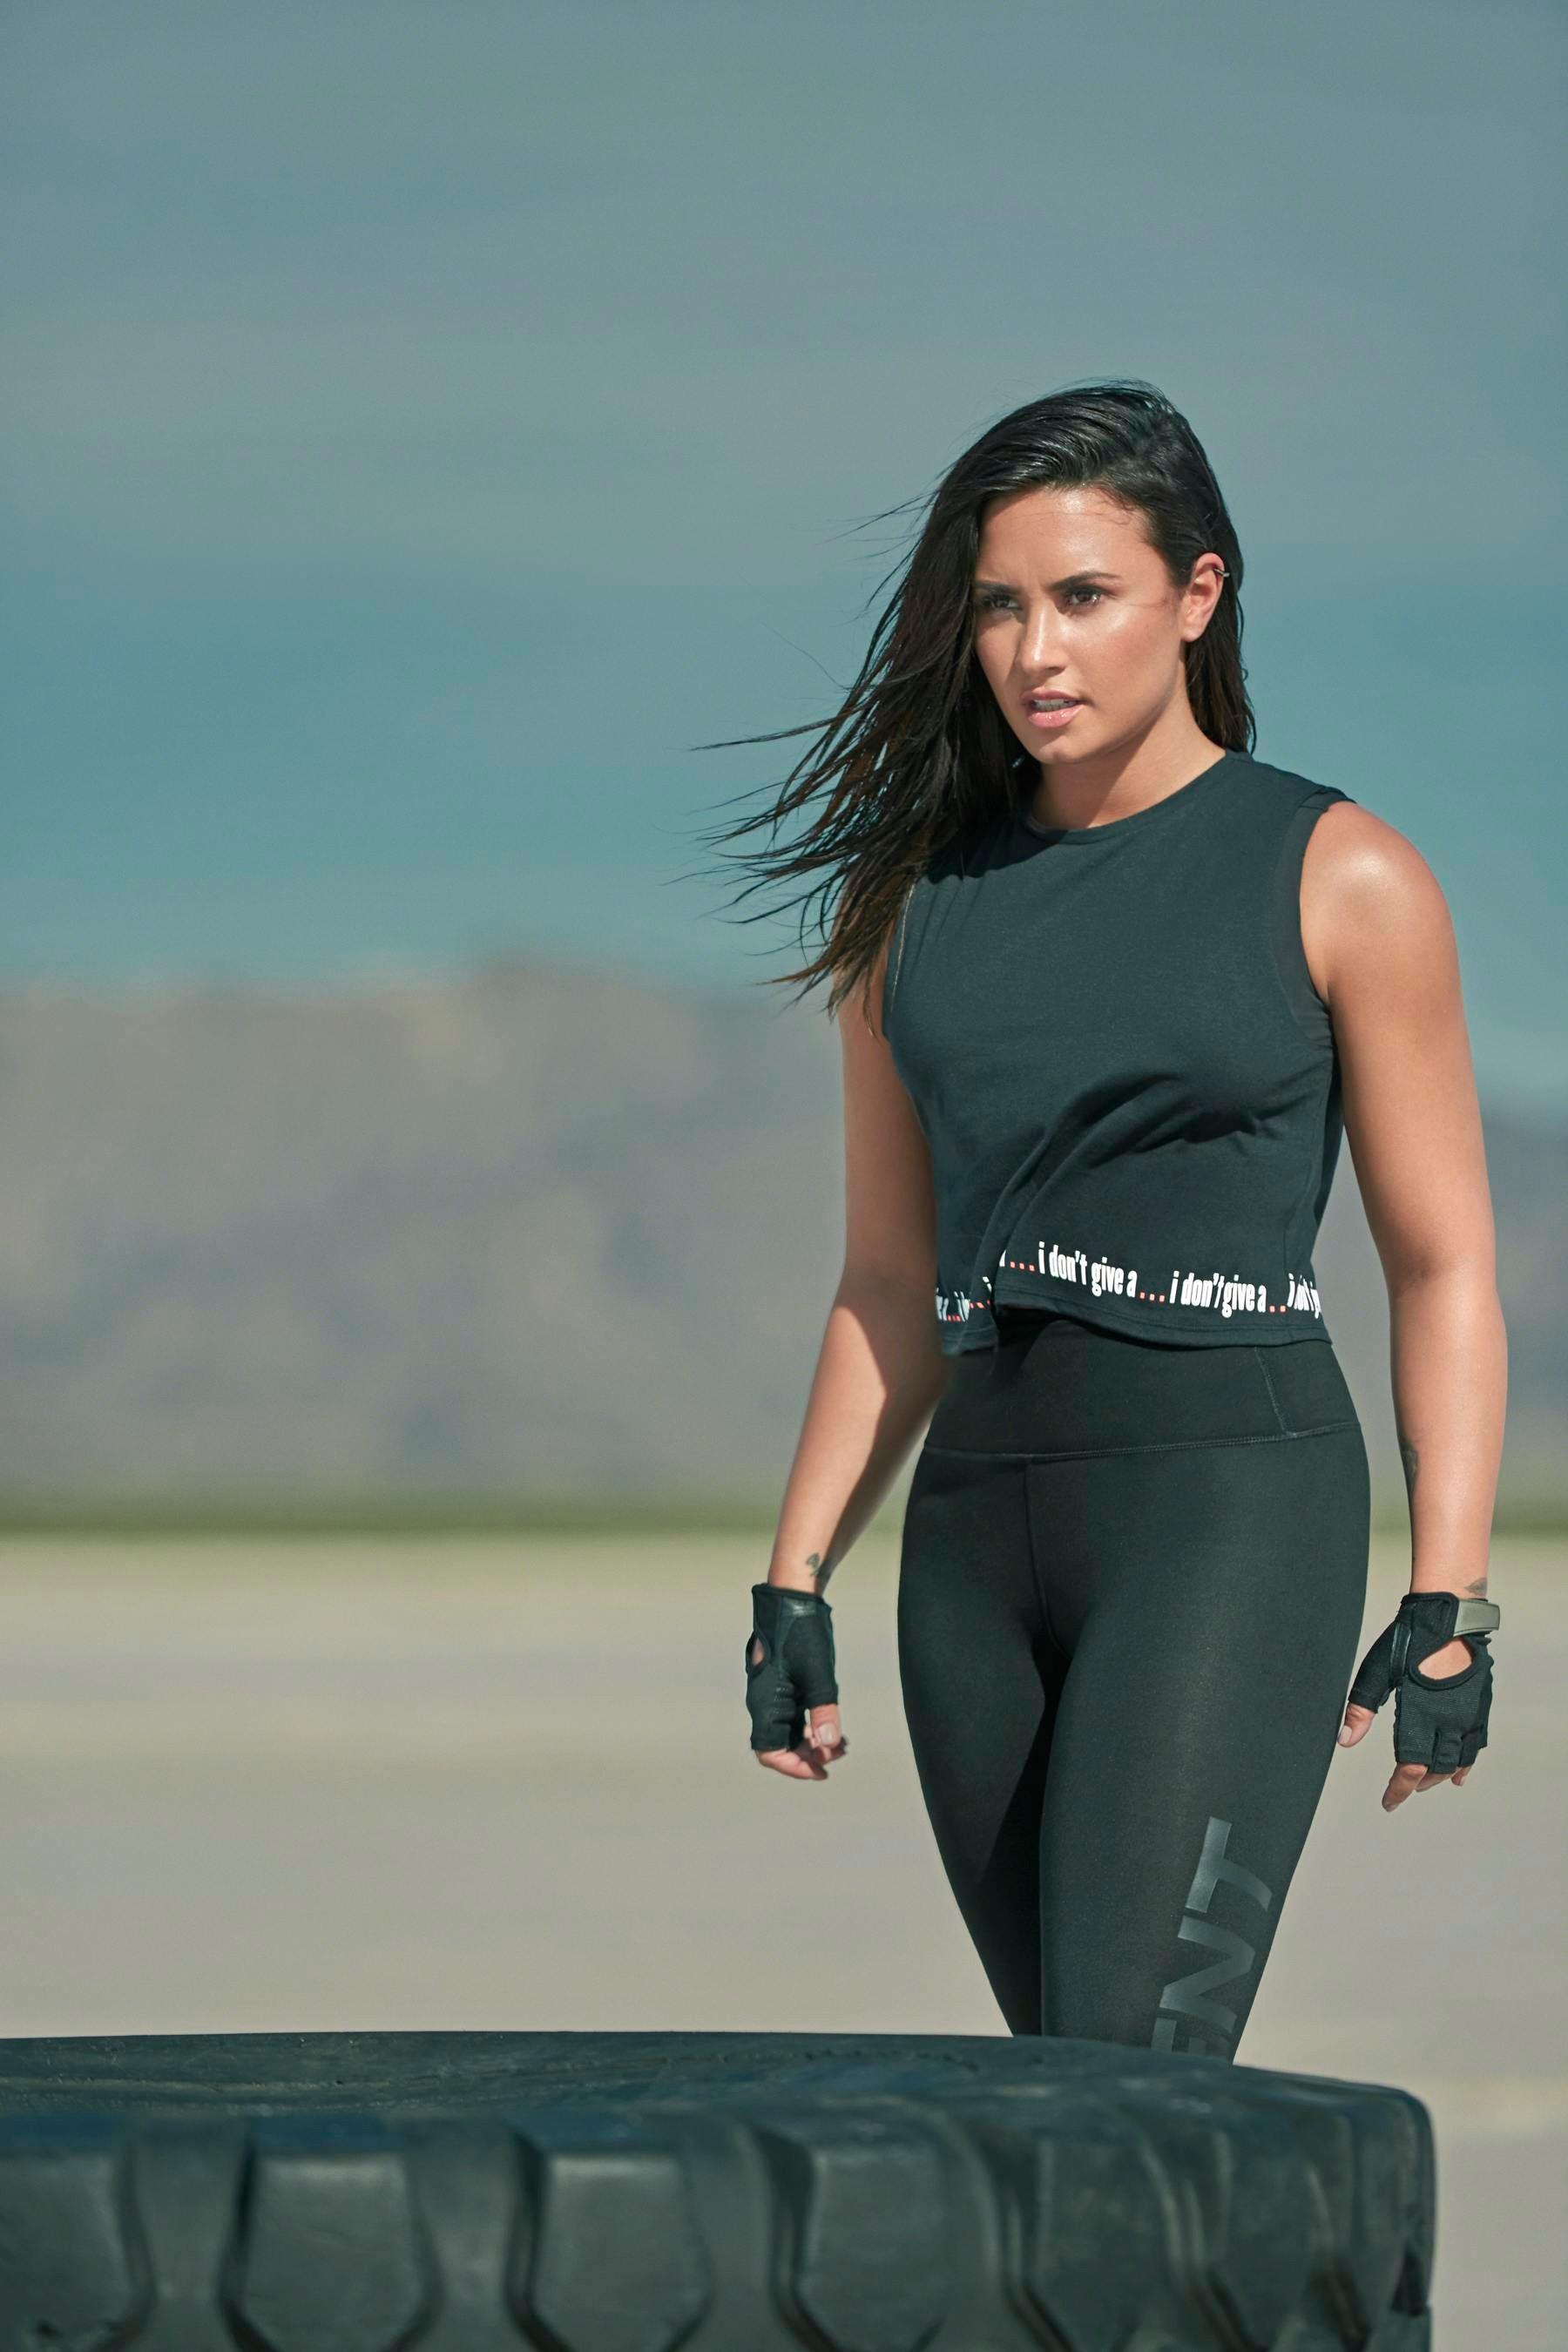 Demi Lovato Fabletics Photoshoot 2017 13 Gotceleb